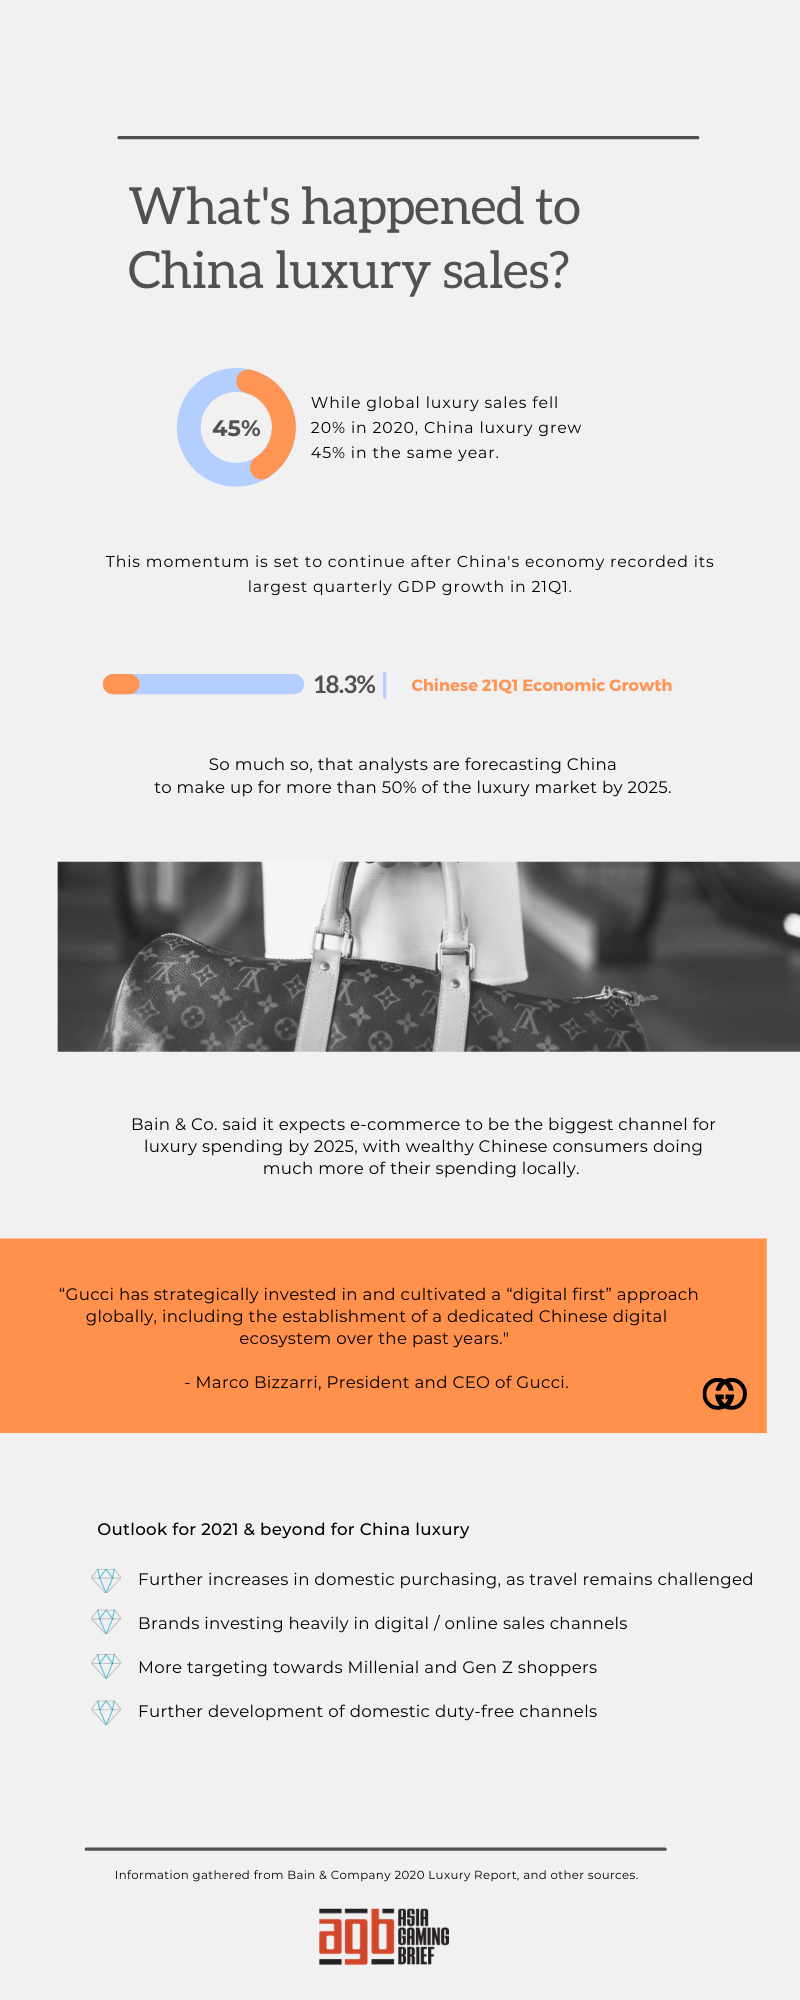 china's, luxury sales, luxury market, chinese